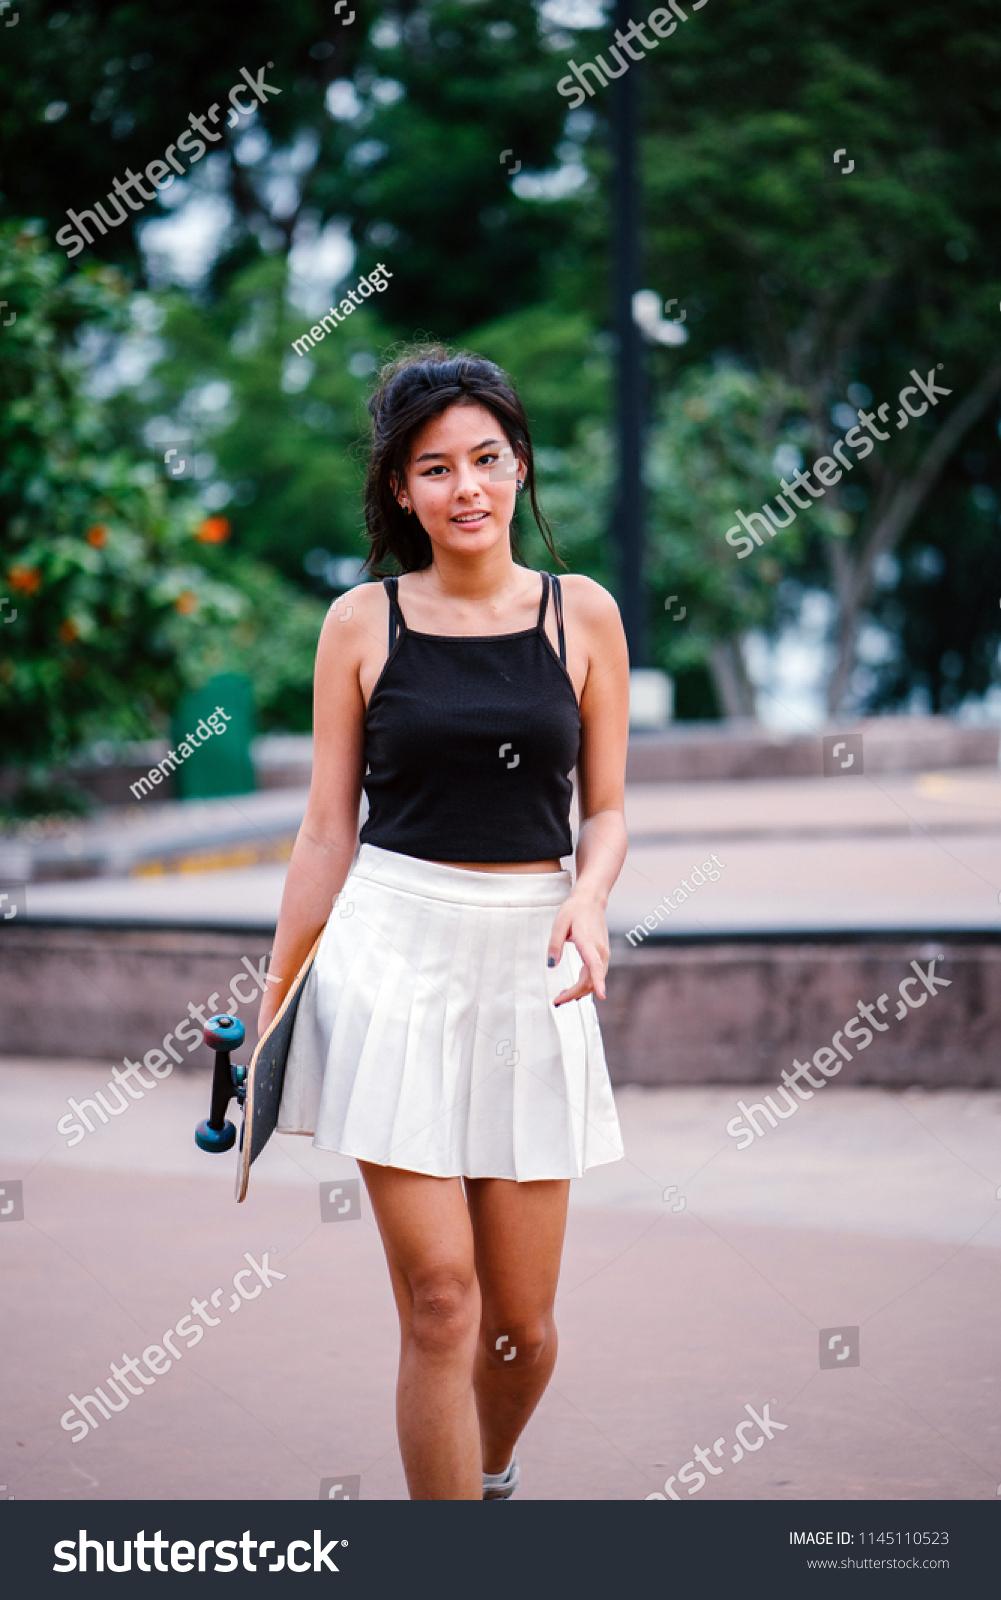 zu-junge-asiatische-maedchen-fick-latina-frau